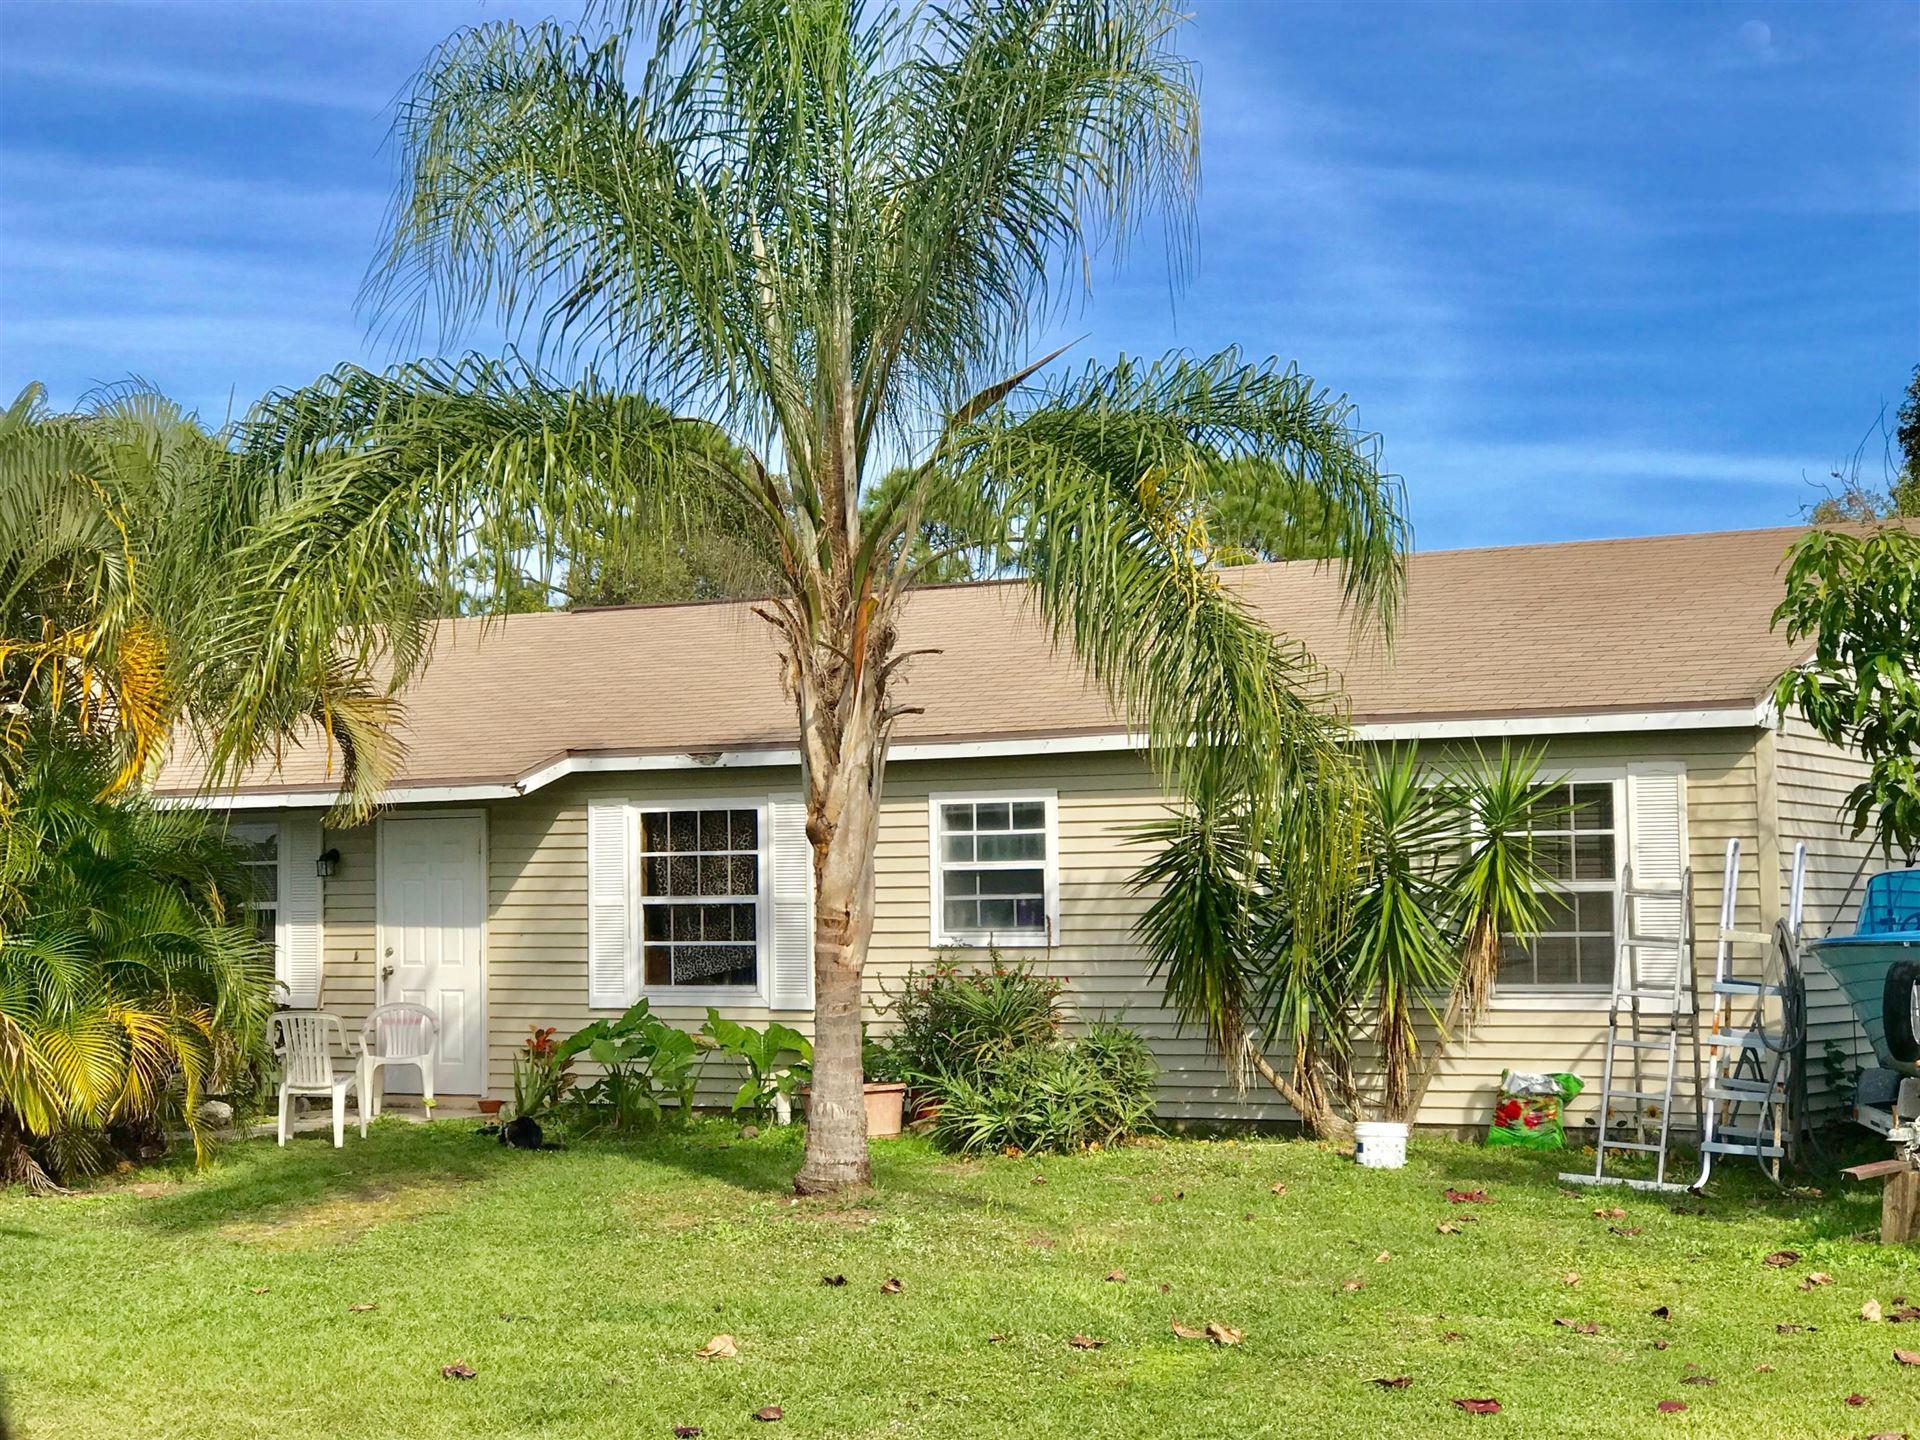 1341 SE Belcrest Street, Port Saint Lucie, FL 34952 - #: RX-10632830